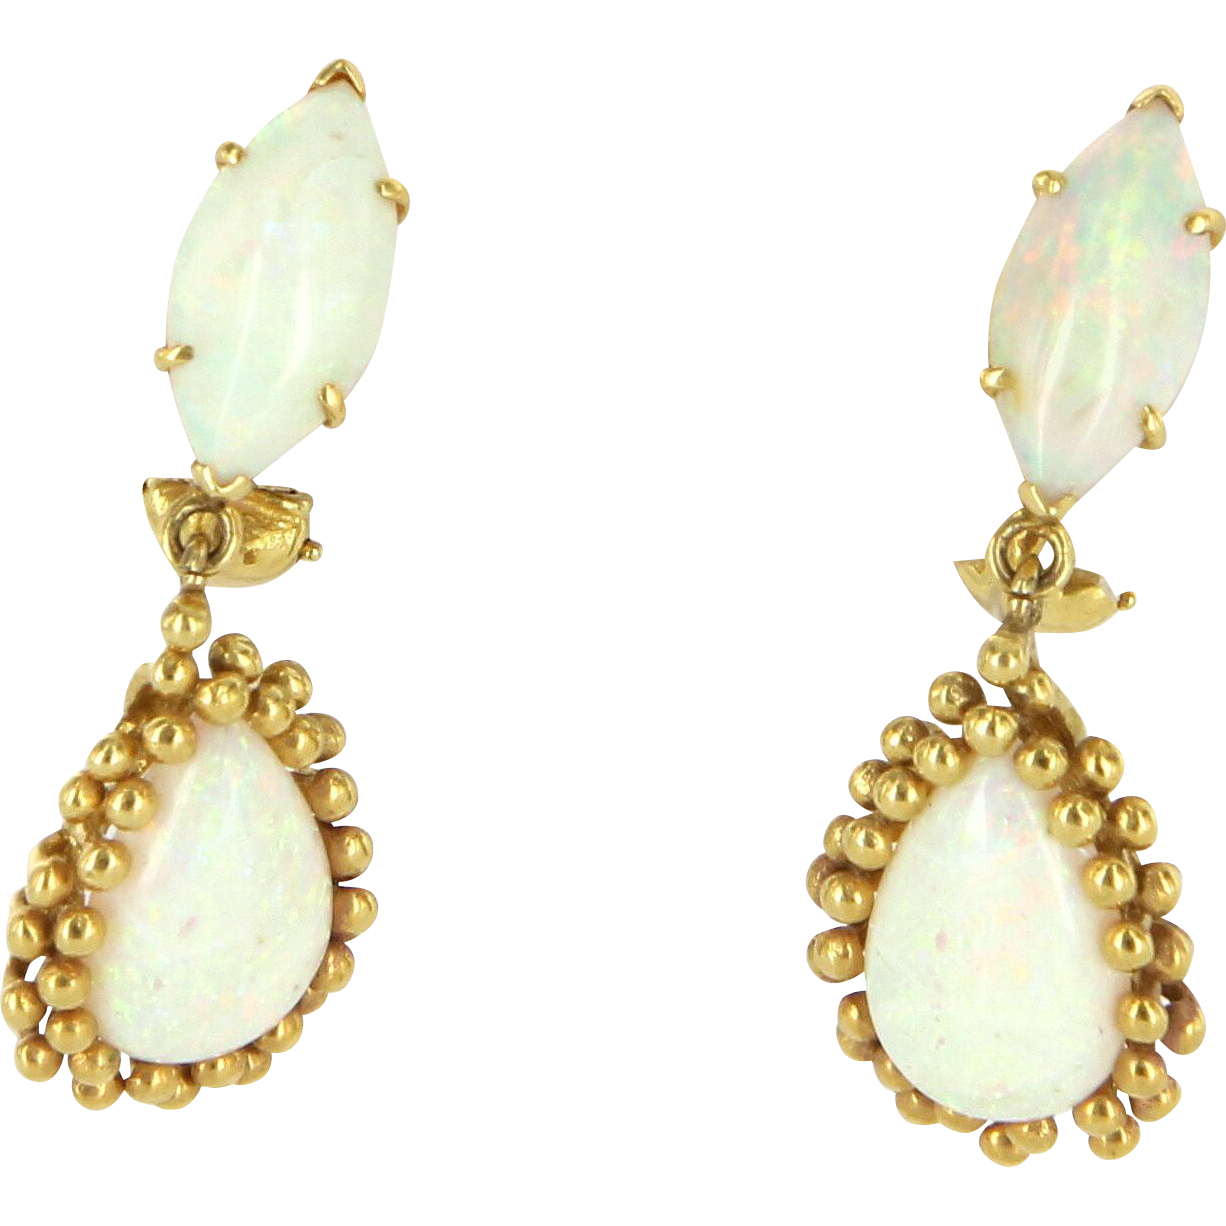 Natural Opal Drop Vintage Clip Earrings 14 Karat Yellow Gold Estate Fine Jewelry